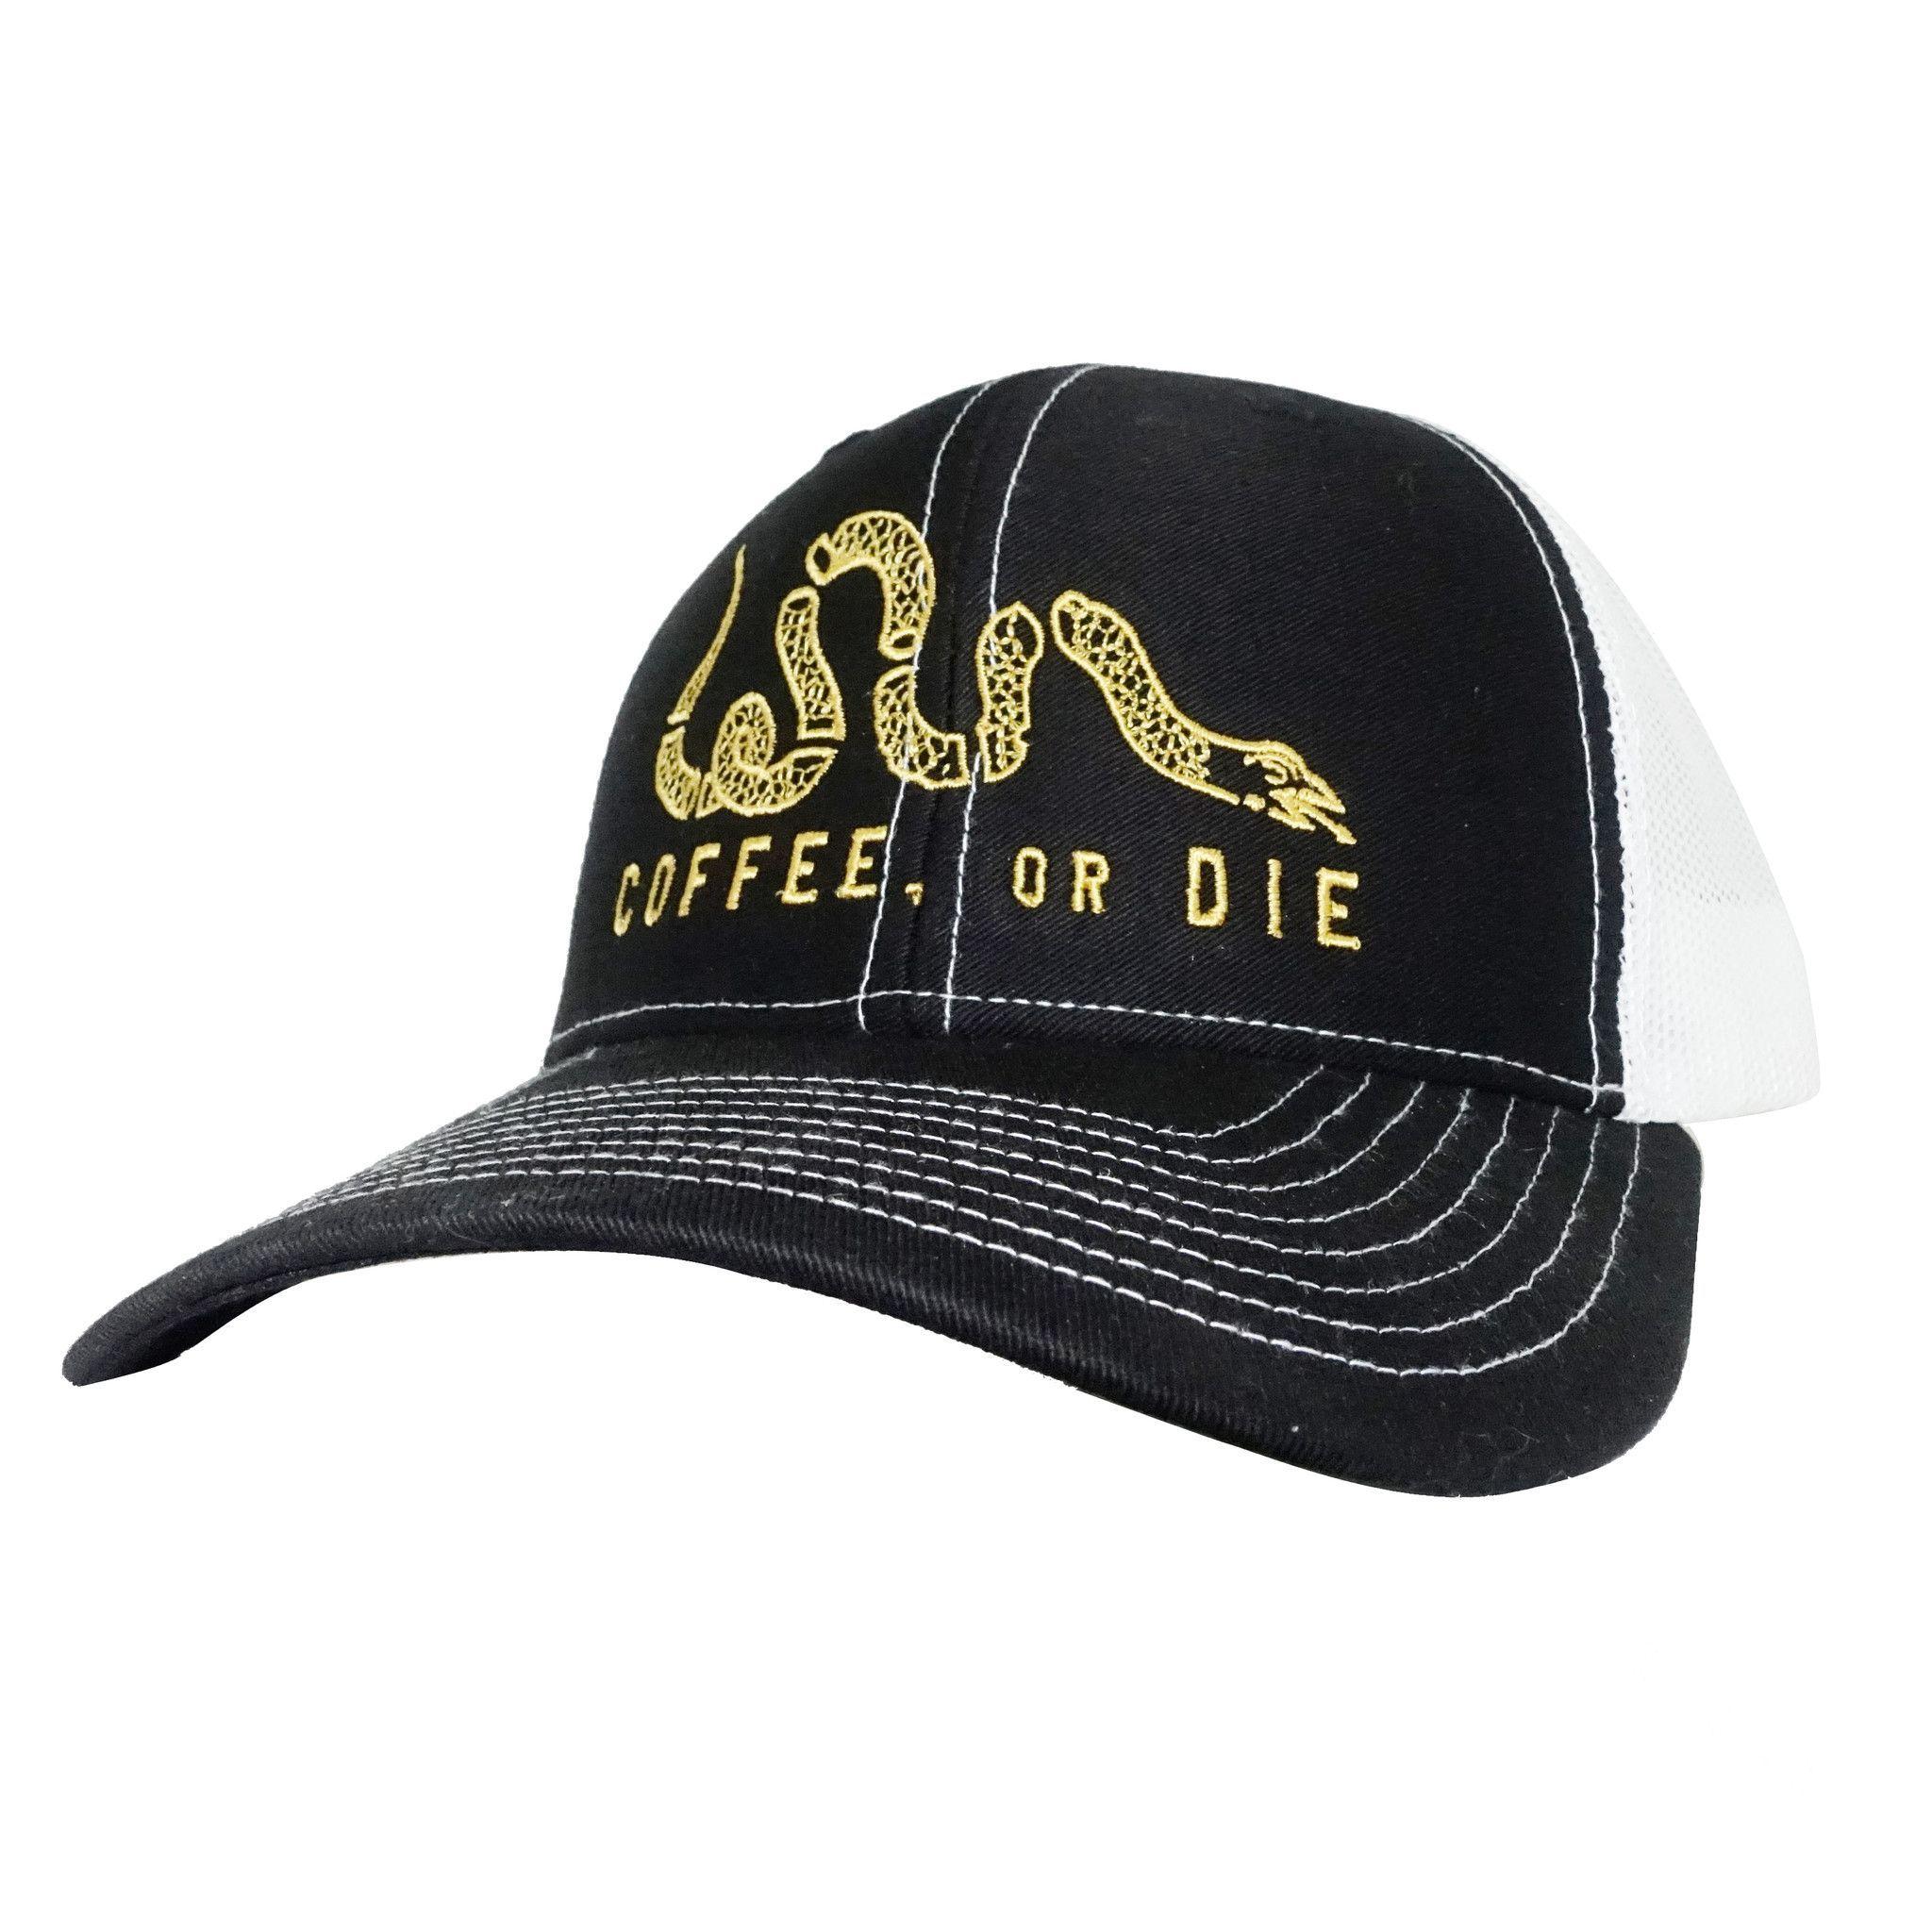 55e02e2684b37 Coffee or Die Trucker Hat - Black on White Mesh - Black Rifle Coffee Company